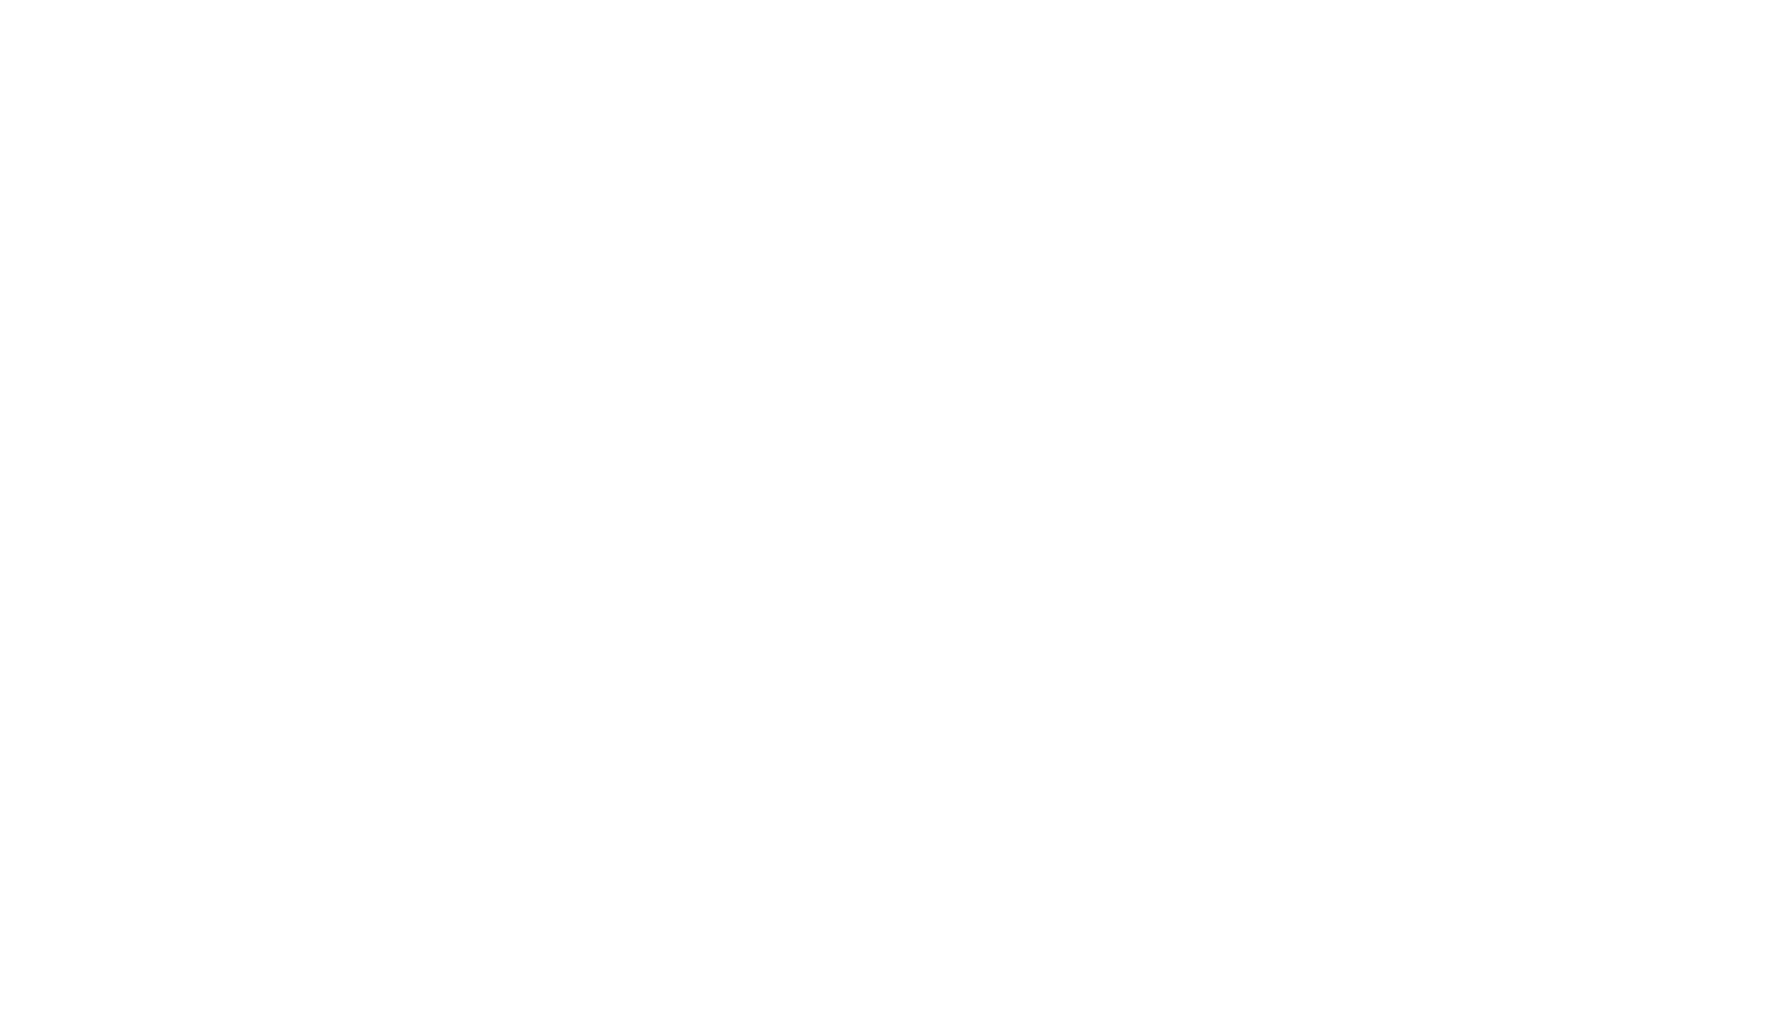 Logo der Messe IDS, Köln